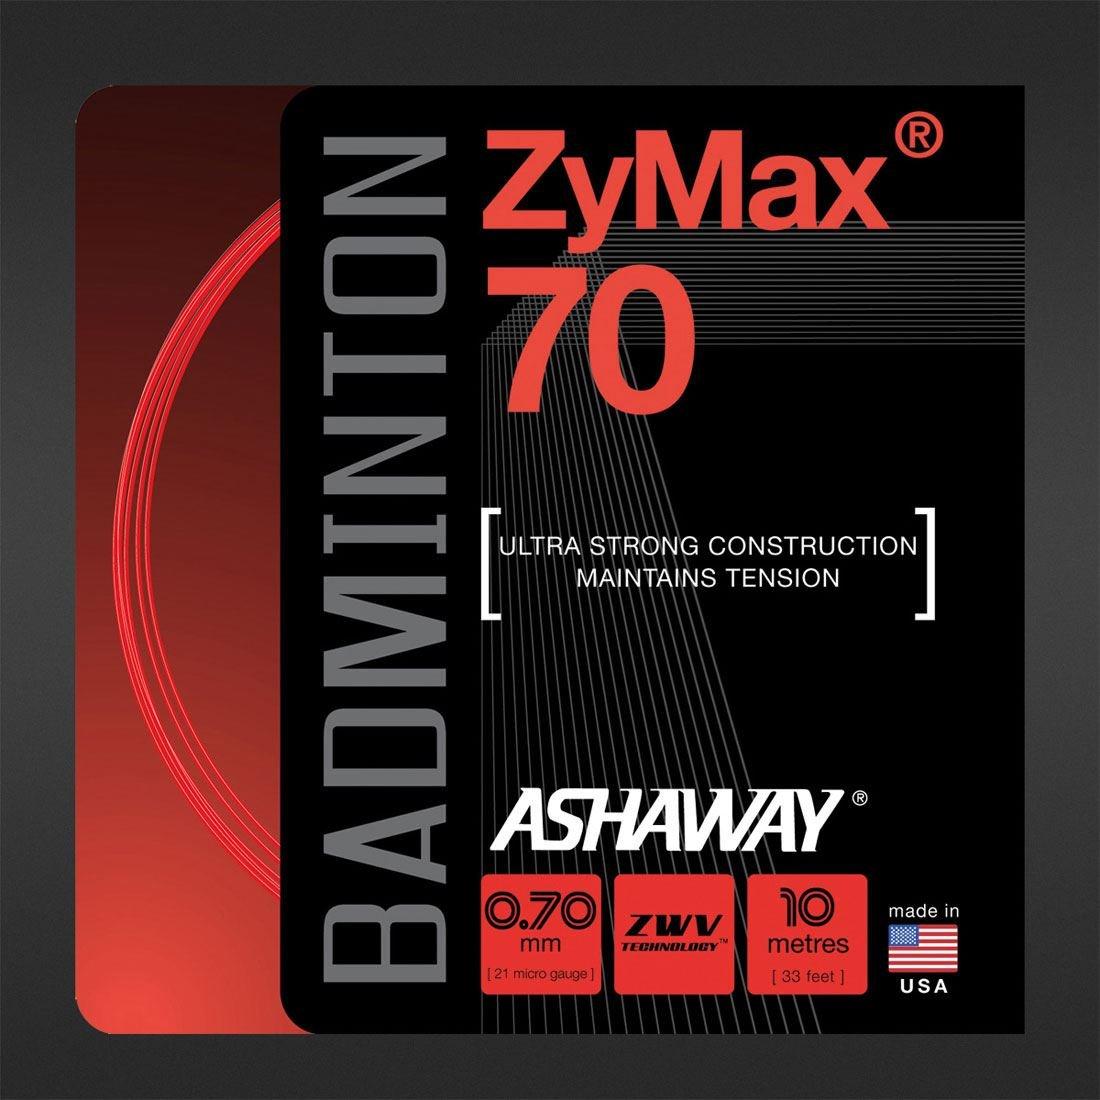 Ashaway Professional /& Begginners Badminton 70 Racket String Zymax Z70sw-10m Set